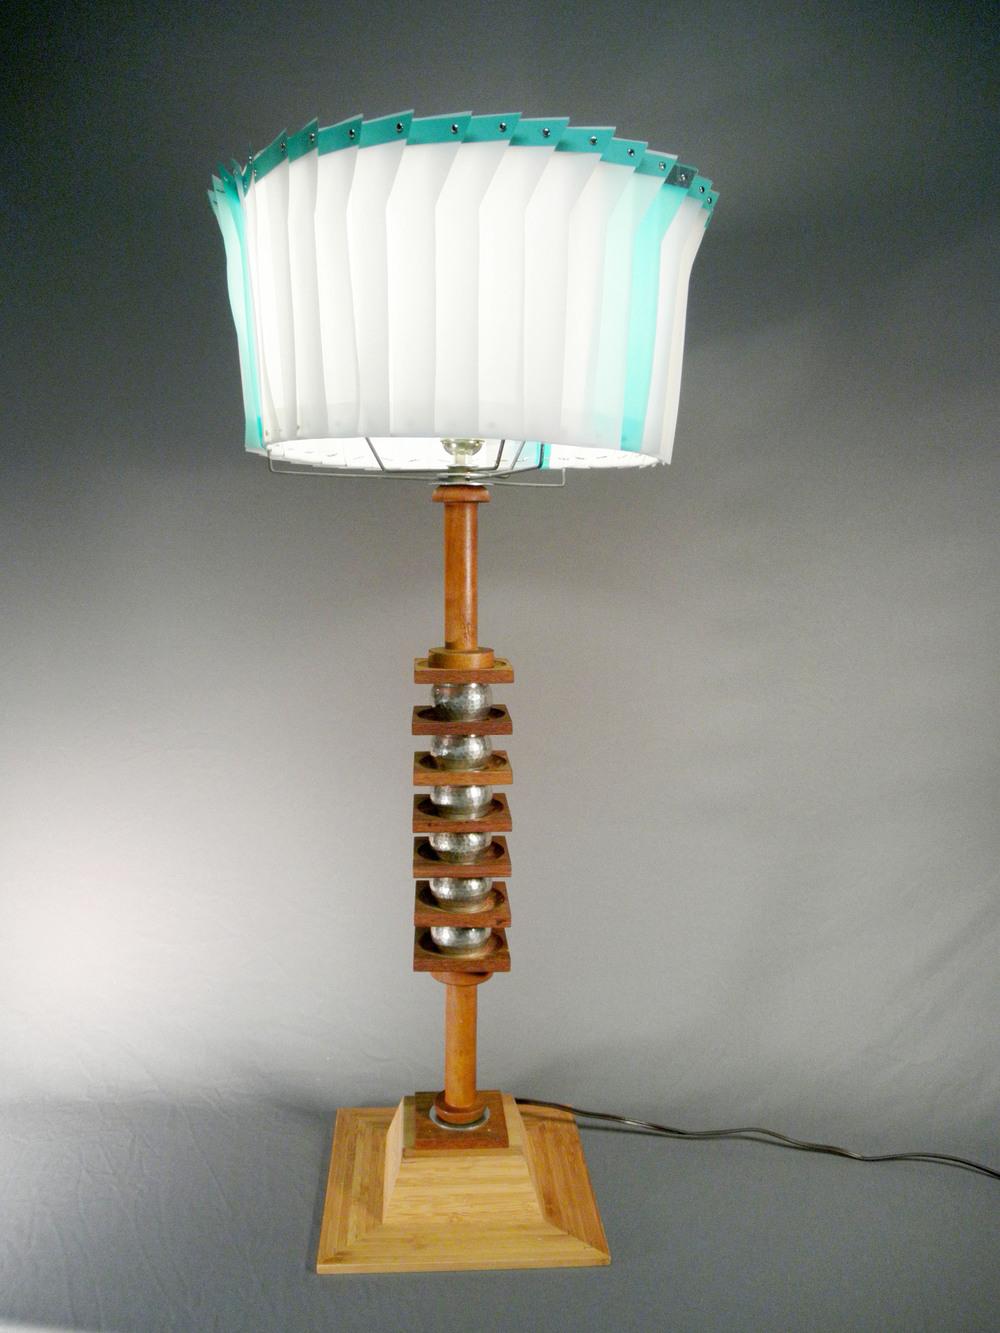 coaster_lamp2013.jpg